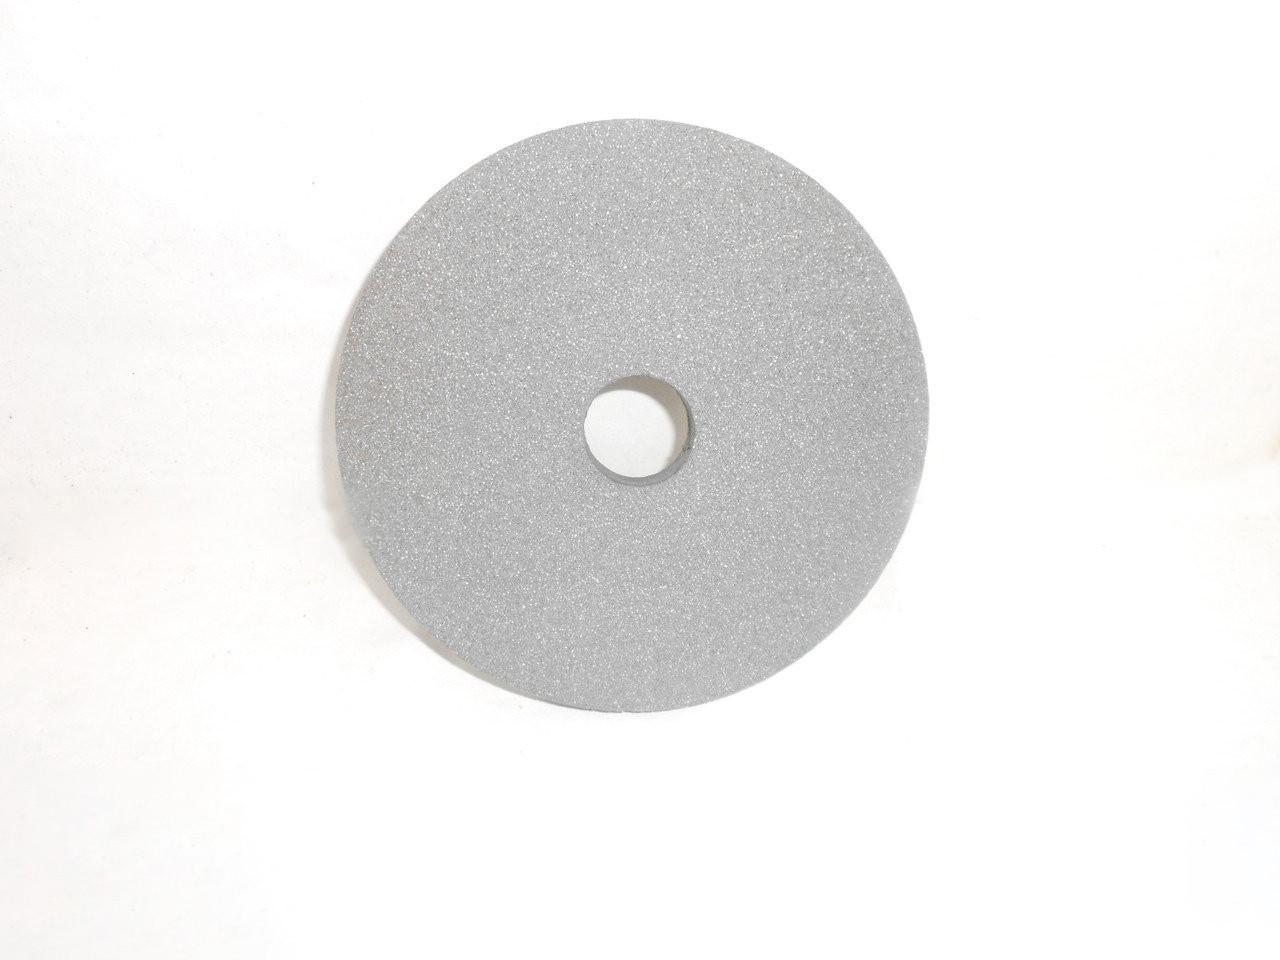 Круг шлифовальный 14А ПП 300х20х127  40 СМ